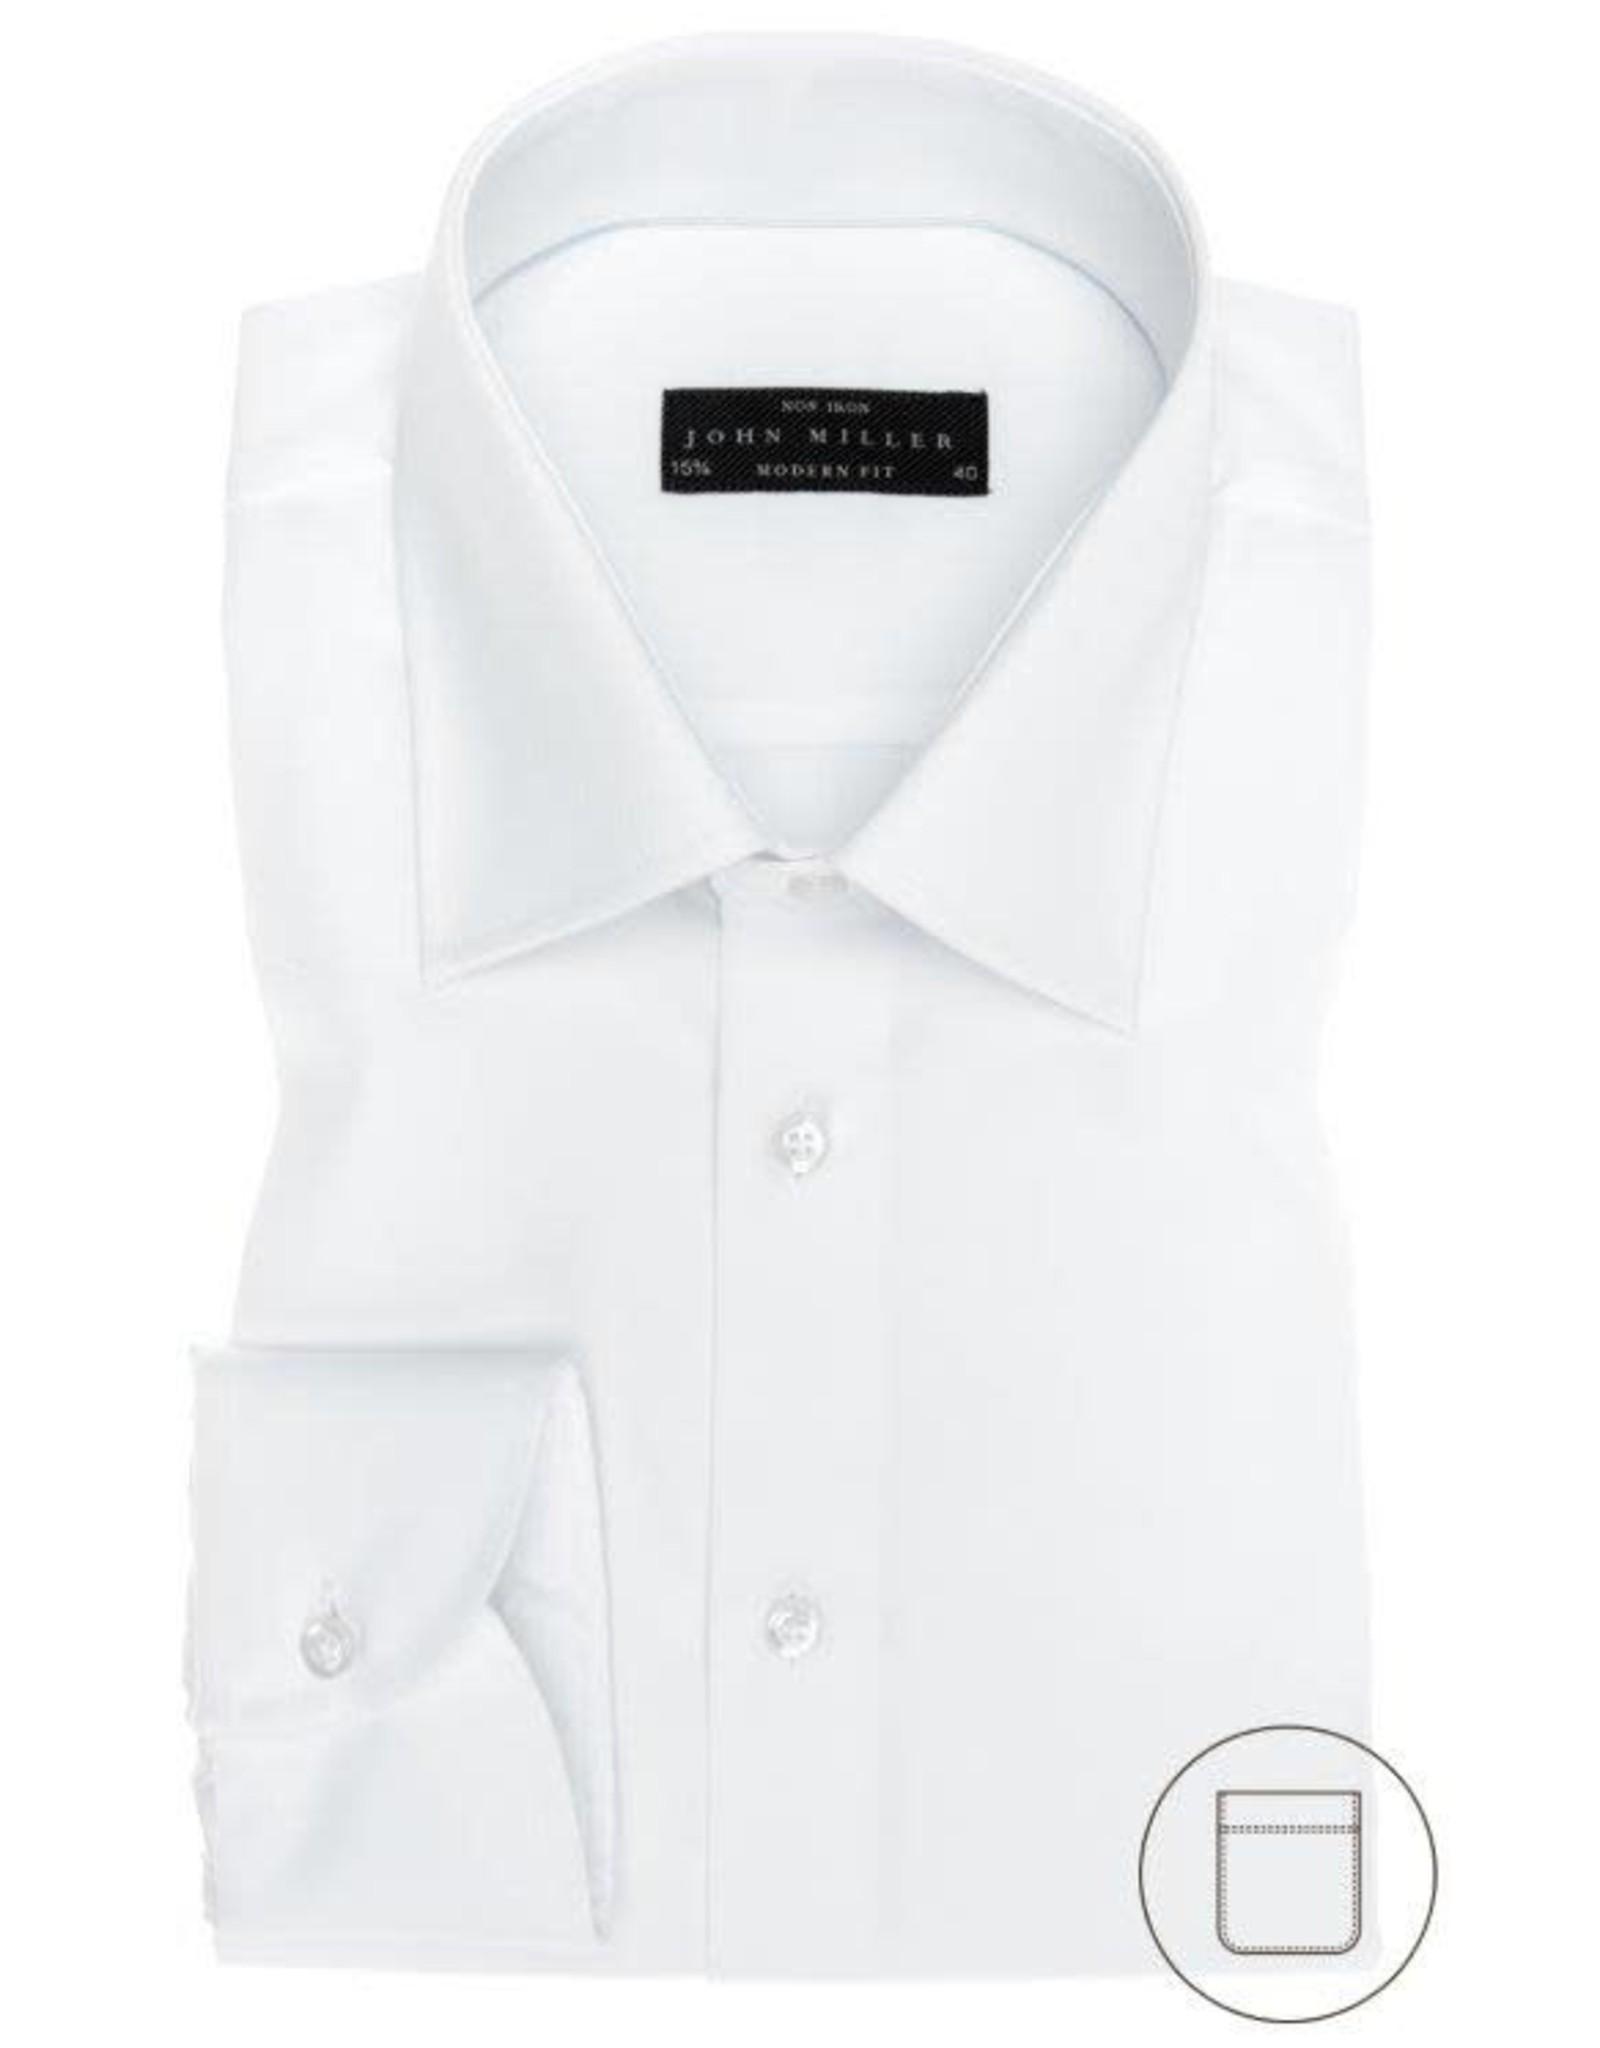 John Miller modern fit overhemd wit met semi spread boord